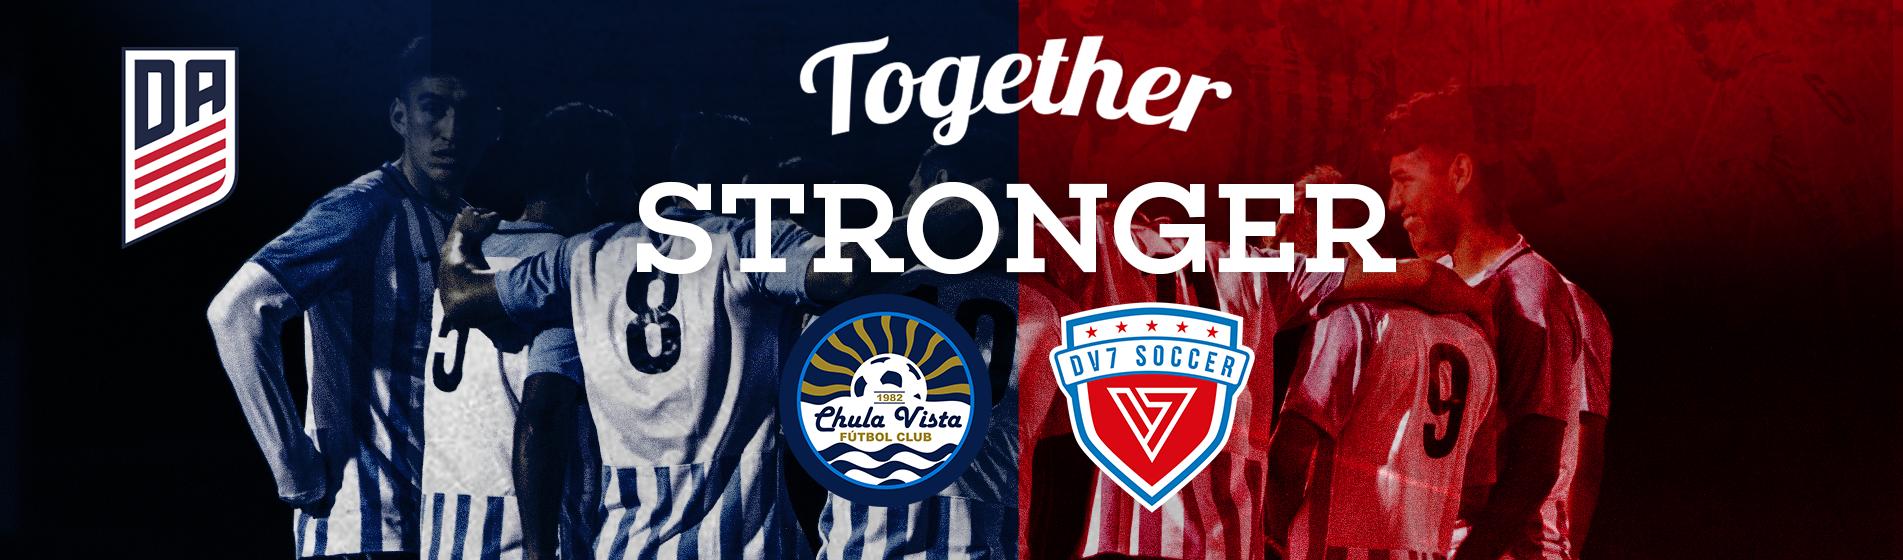 Chula Vista FC and DV7 Soccer partner up